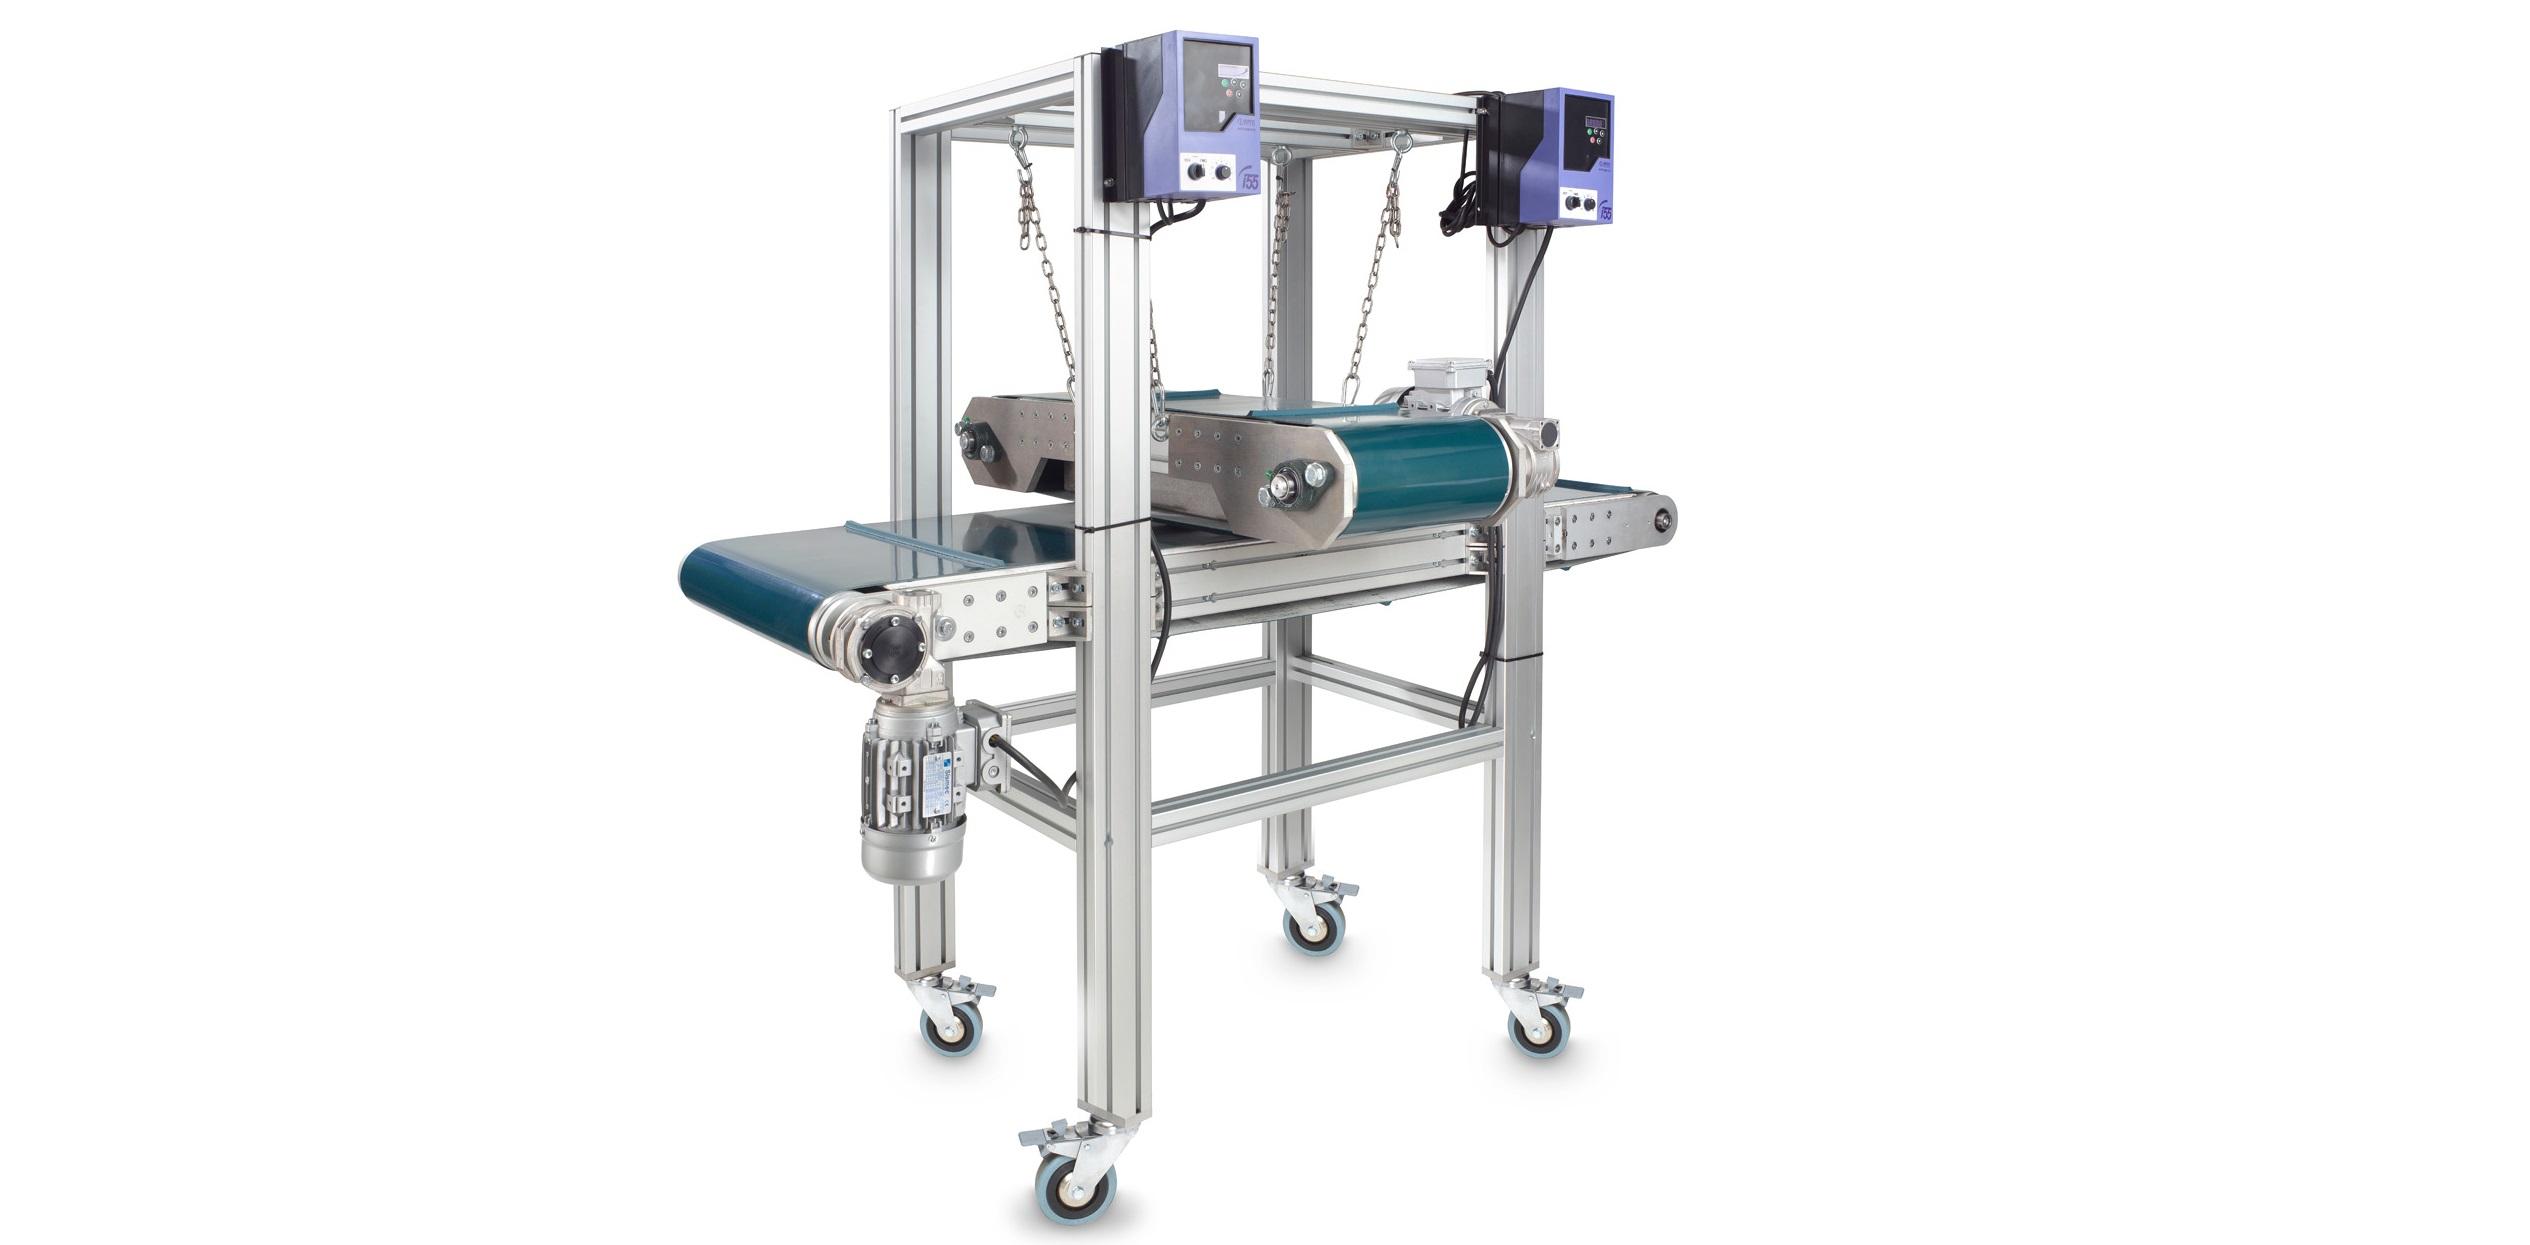 Separador magn tico imaband rn sistemas magn ticos para for Sistema anticalcare magnetico